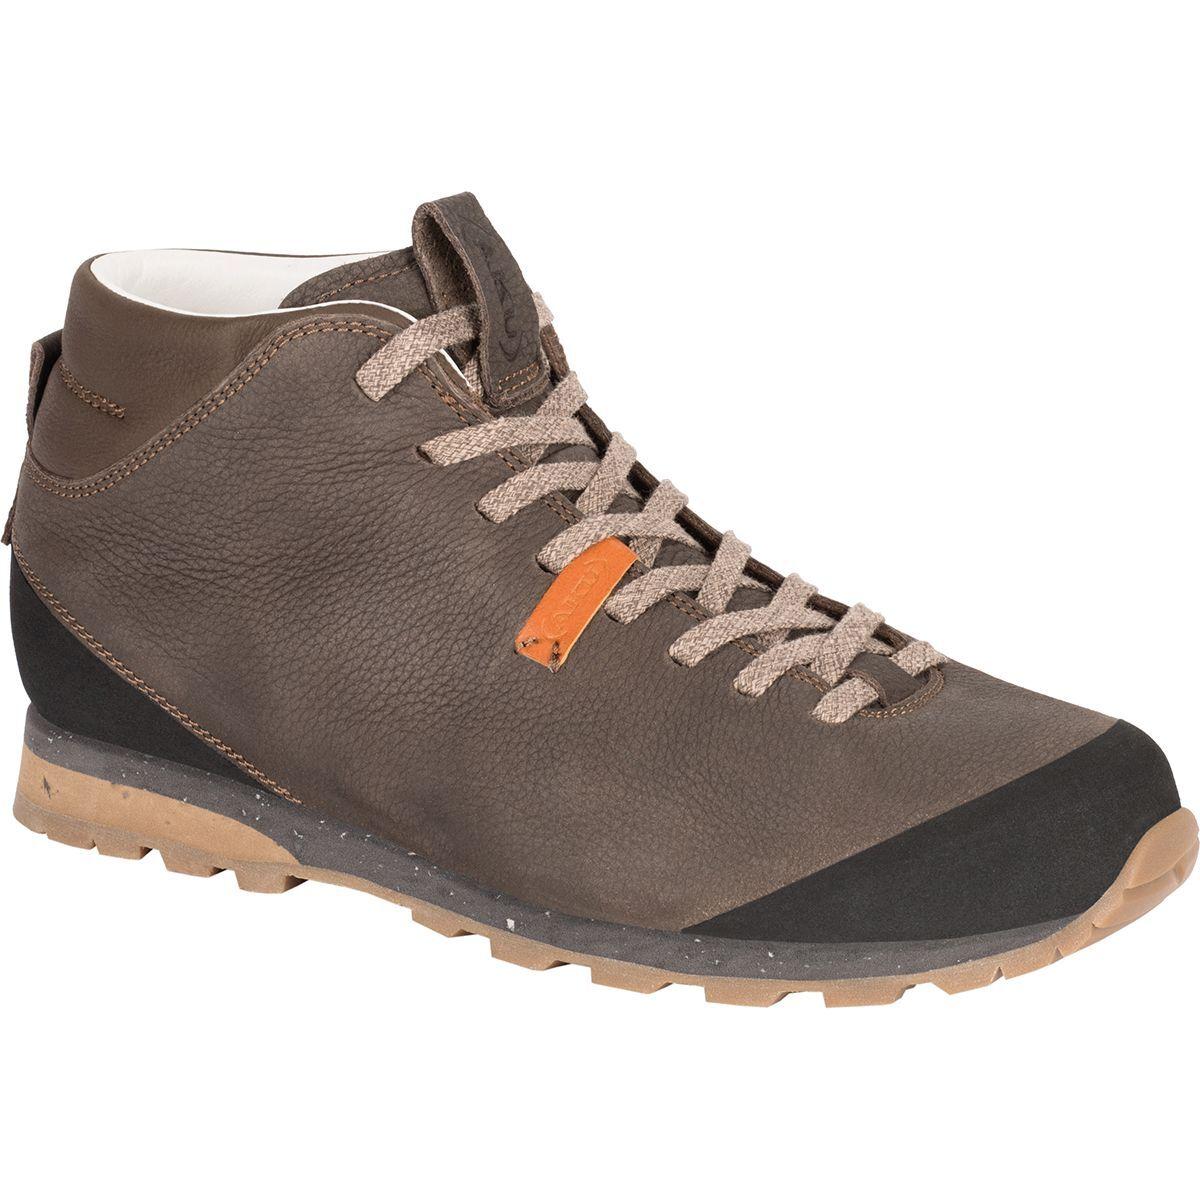 Aku Herren Bellamont II Mid Plus Schuhe Braun 40.5